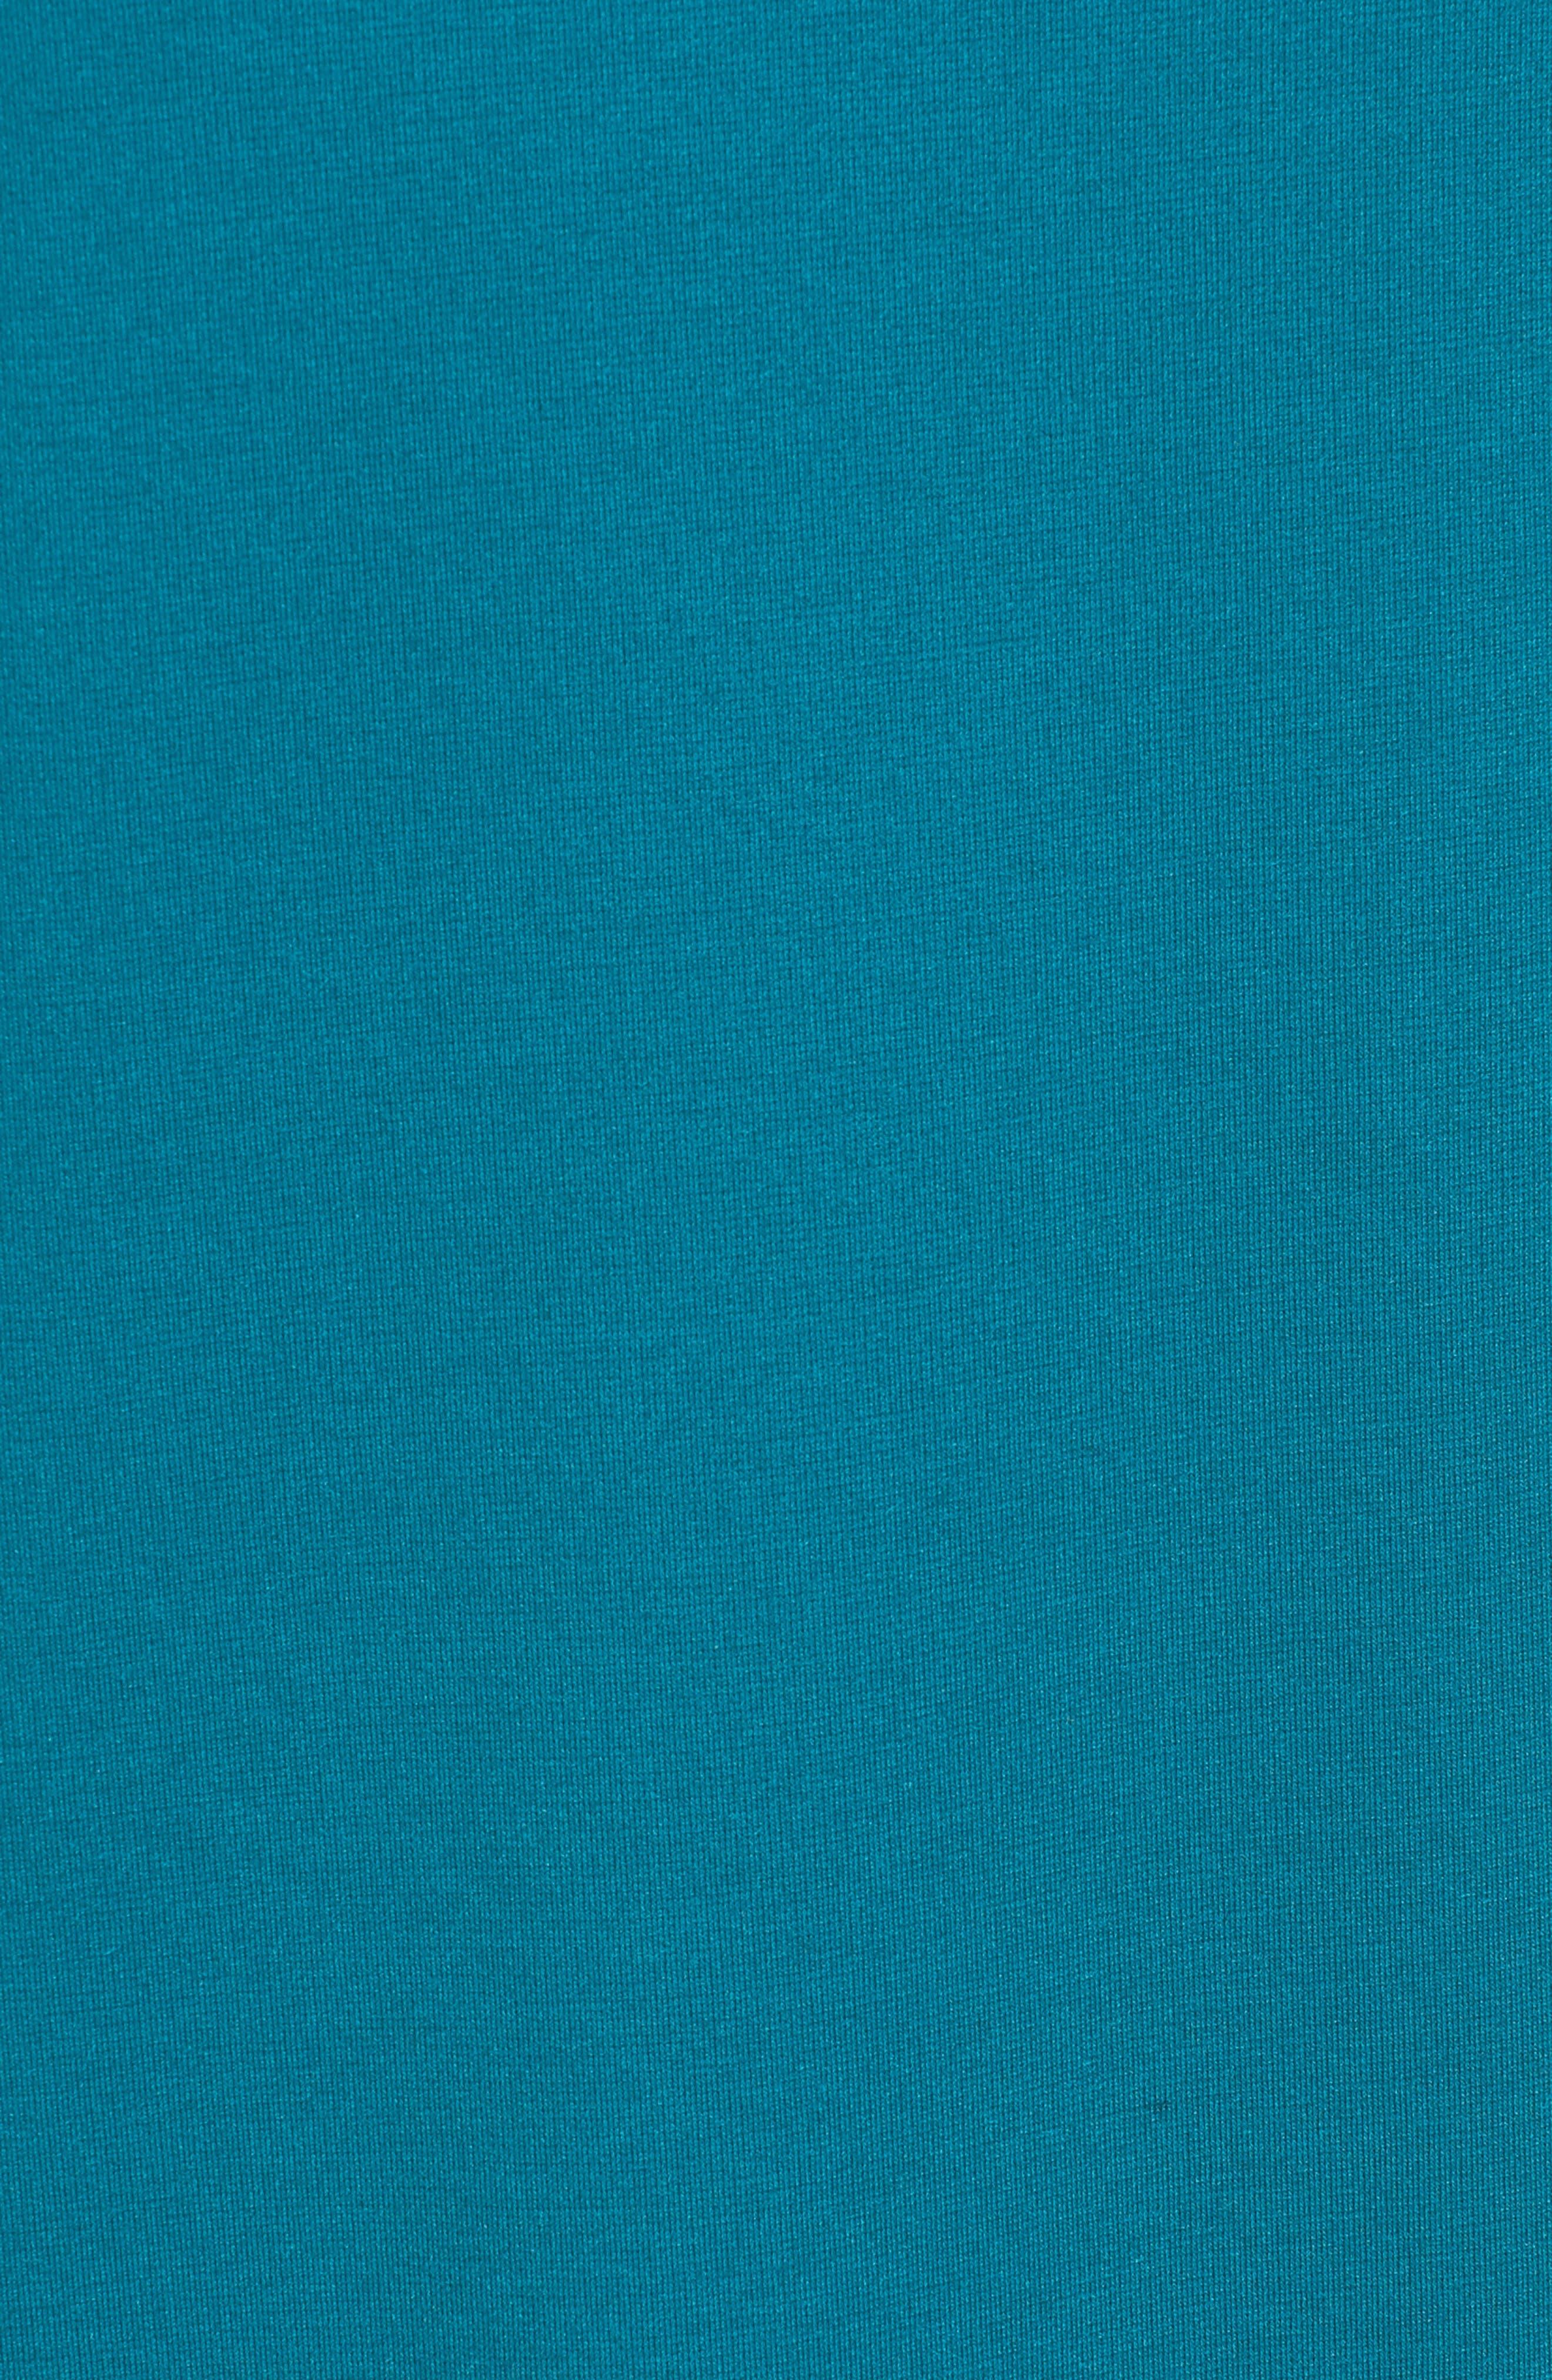 Ruffle Sleeve Shift Dress,                             Alternate thumbnail 5, color,                             Teal